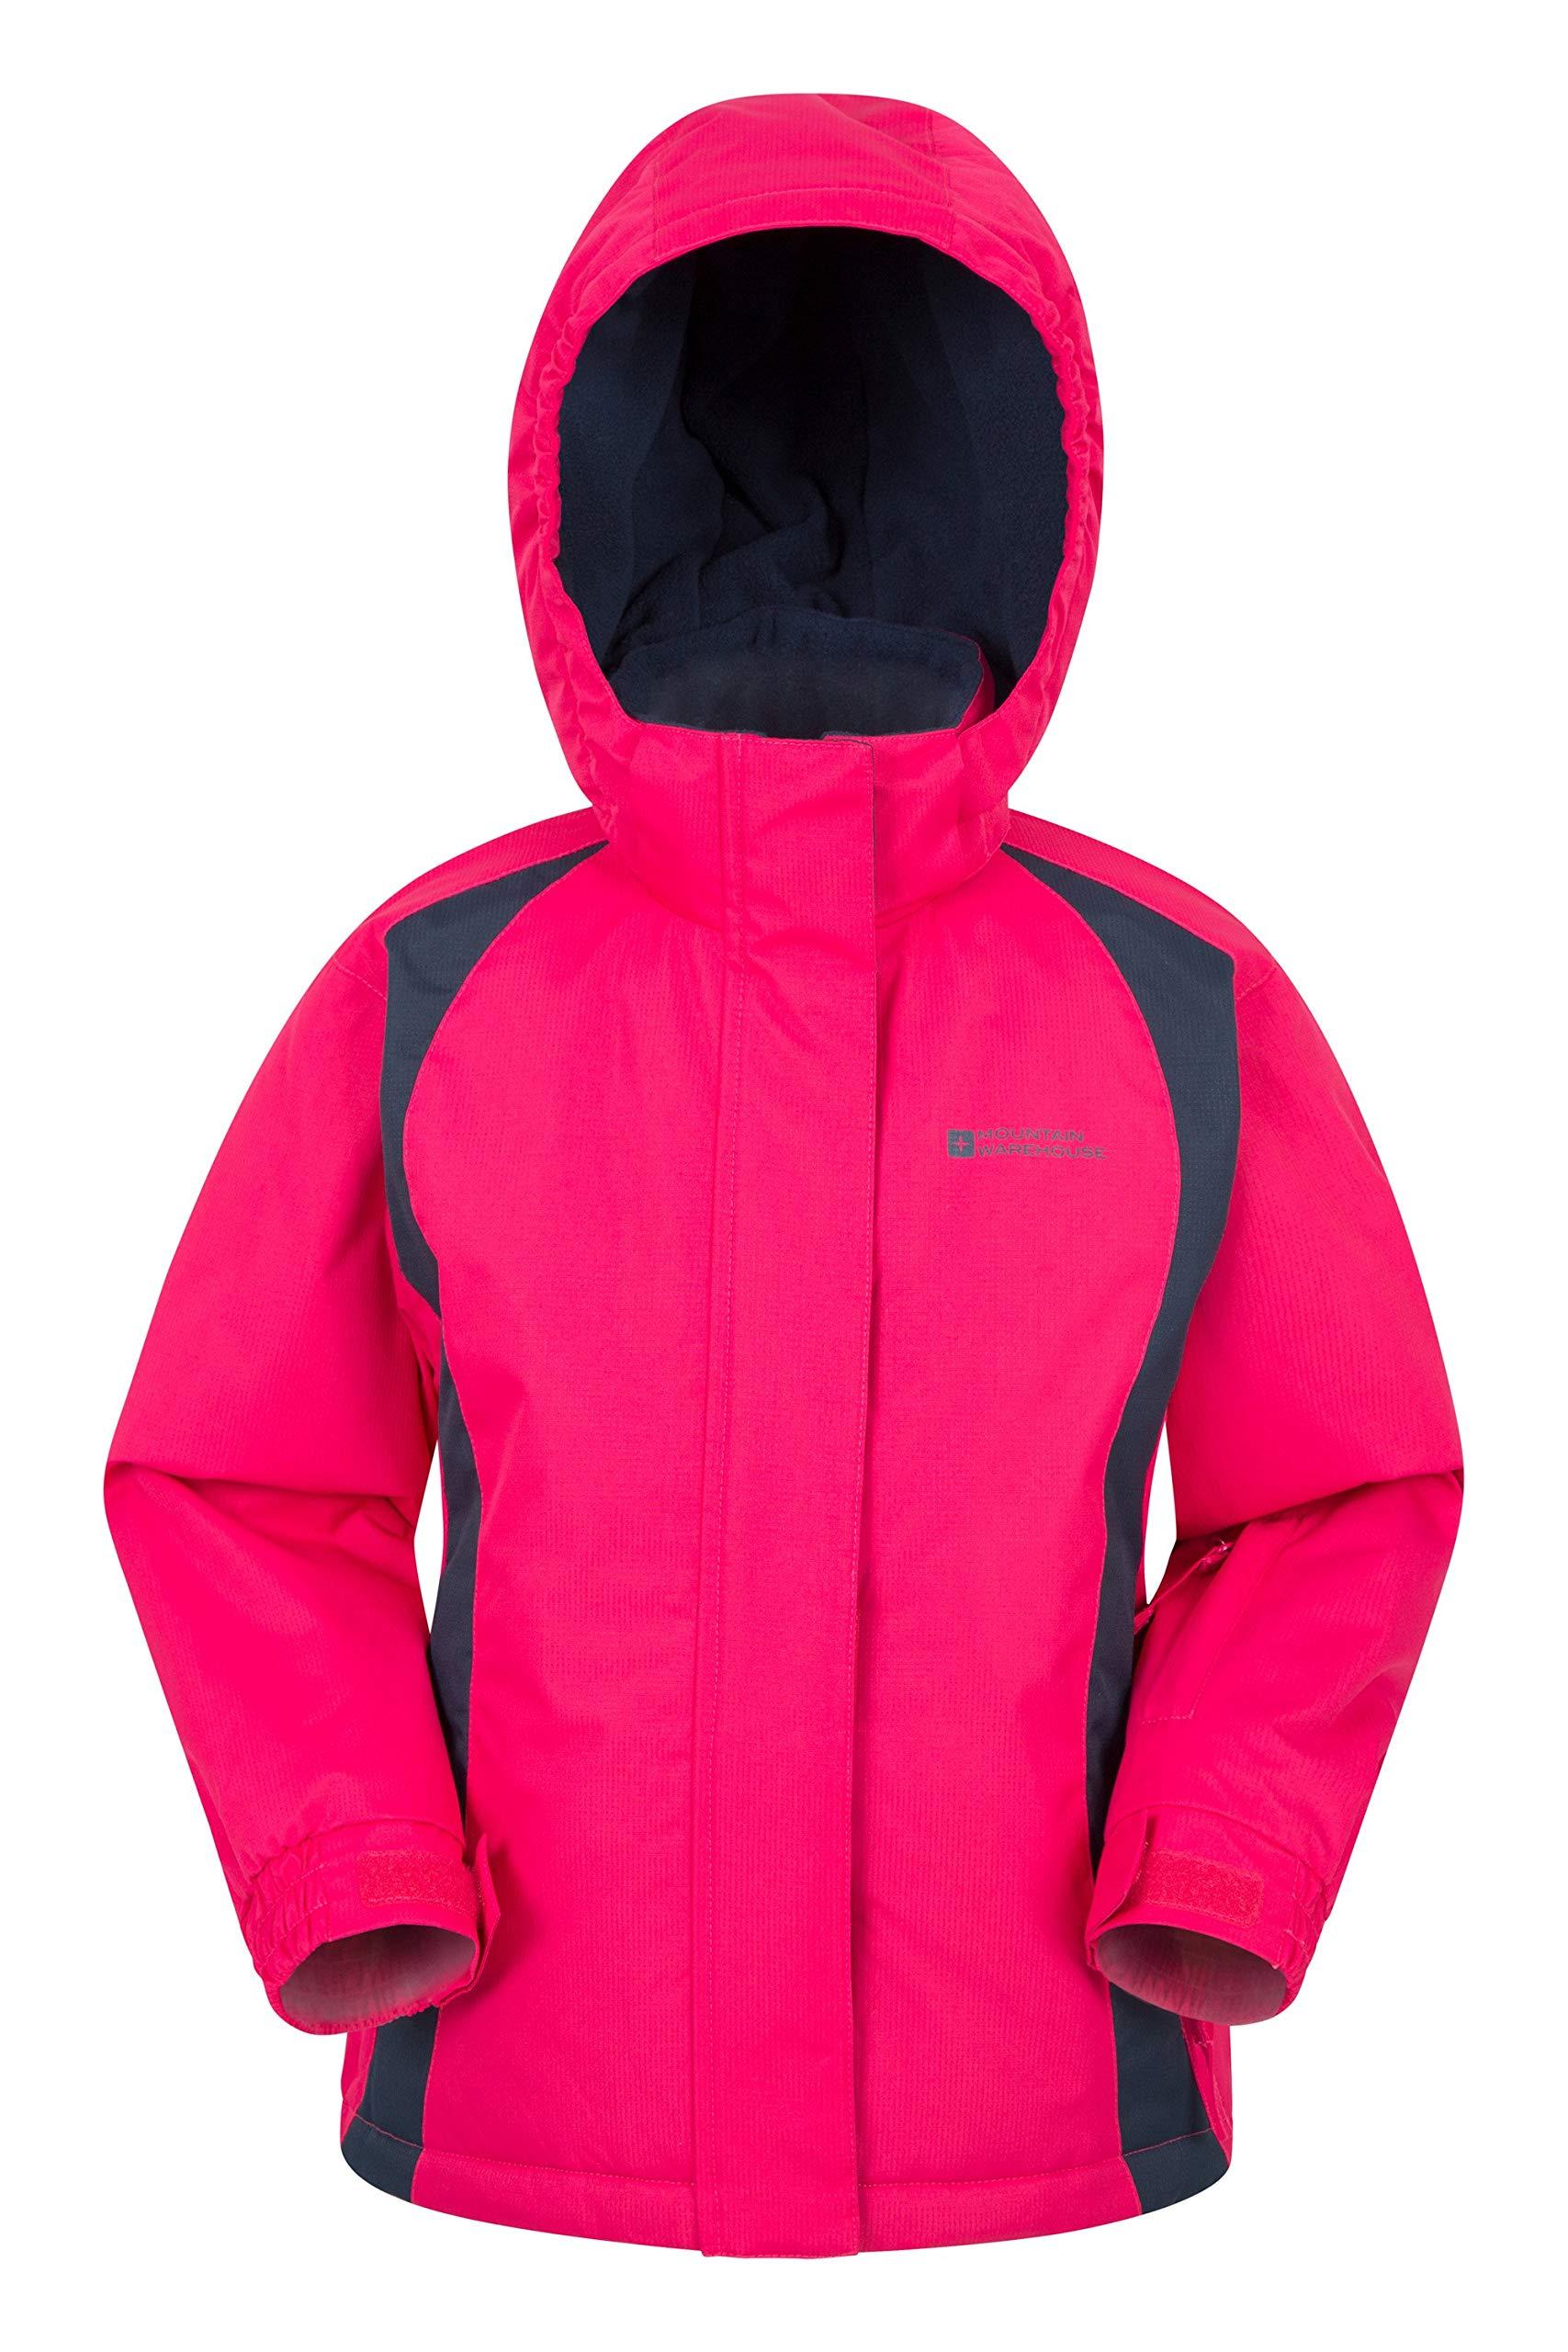 Mountain Warehouse Honey Kids Ski Jacket - Boys